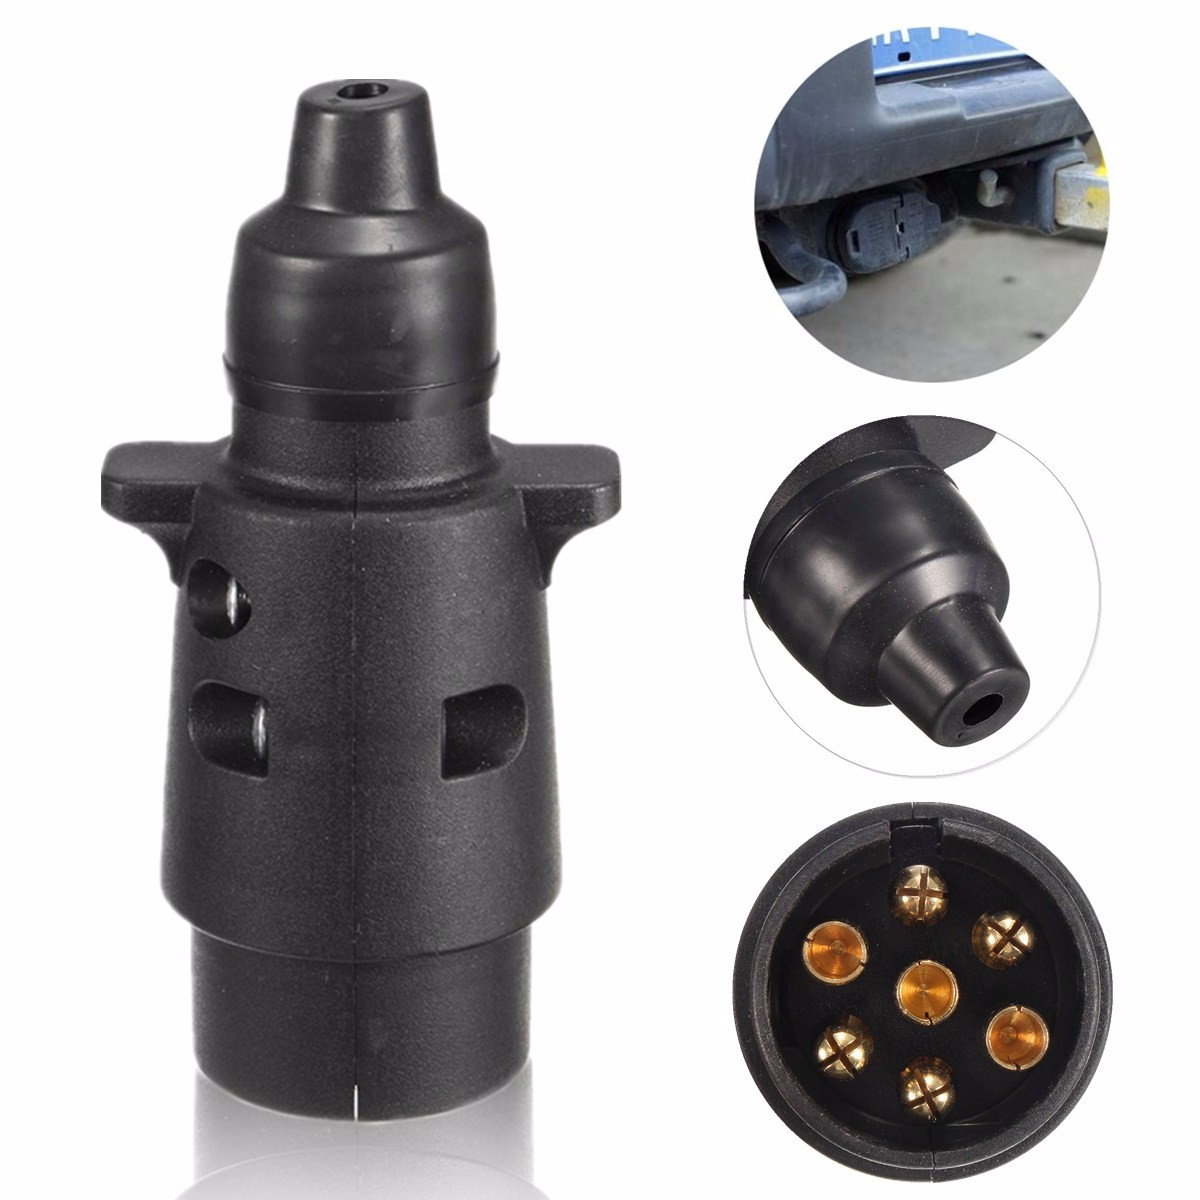 caravan grey socket wiring diagram citroen c5 towbar 7pin towing 12n type electrics converter adapter